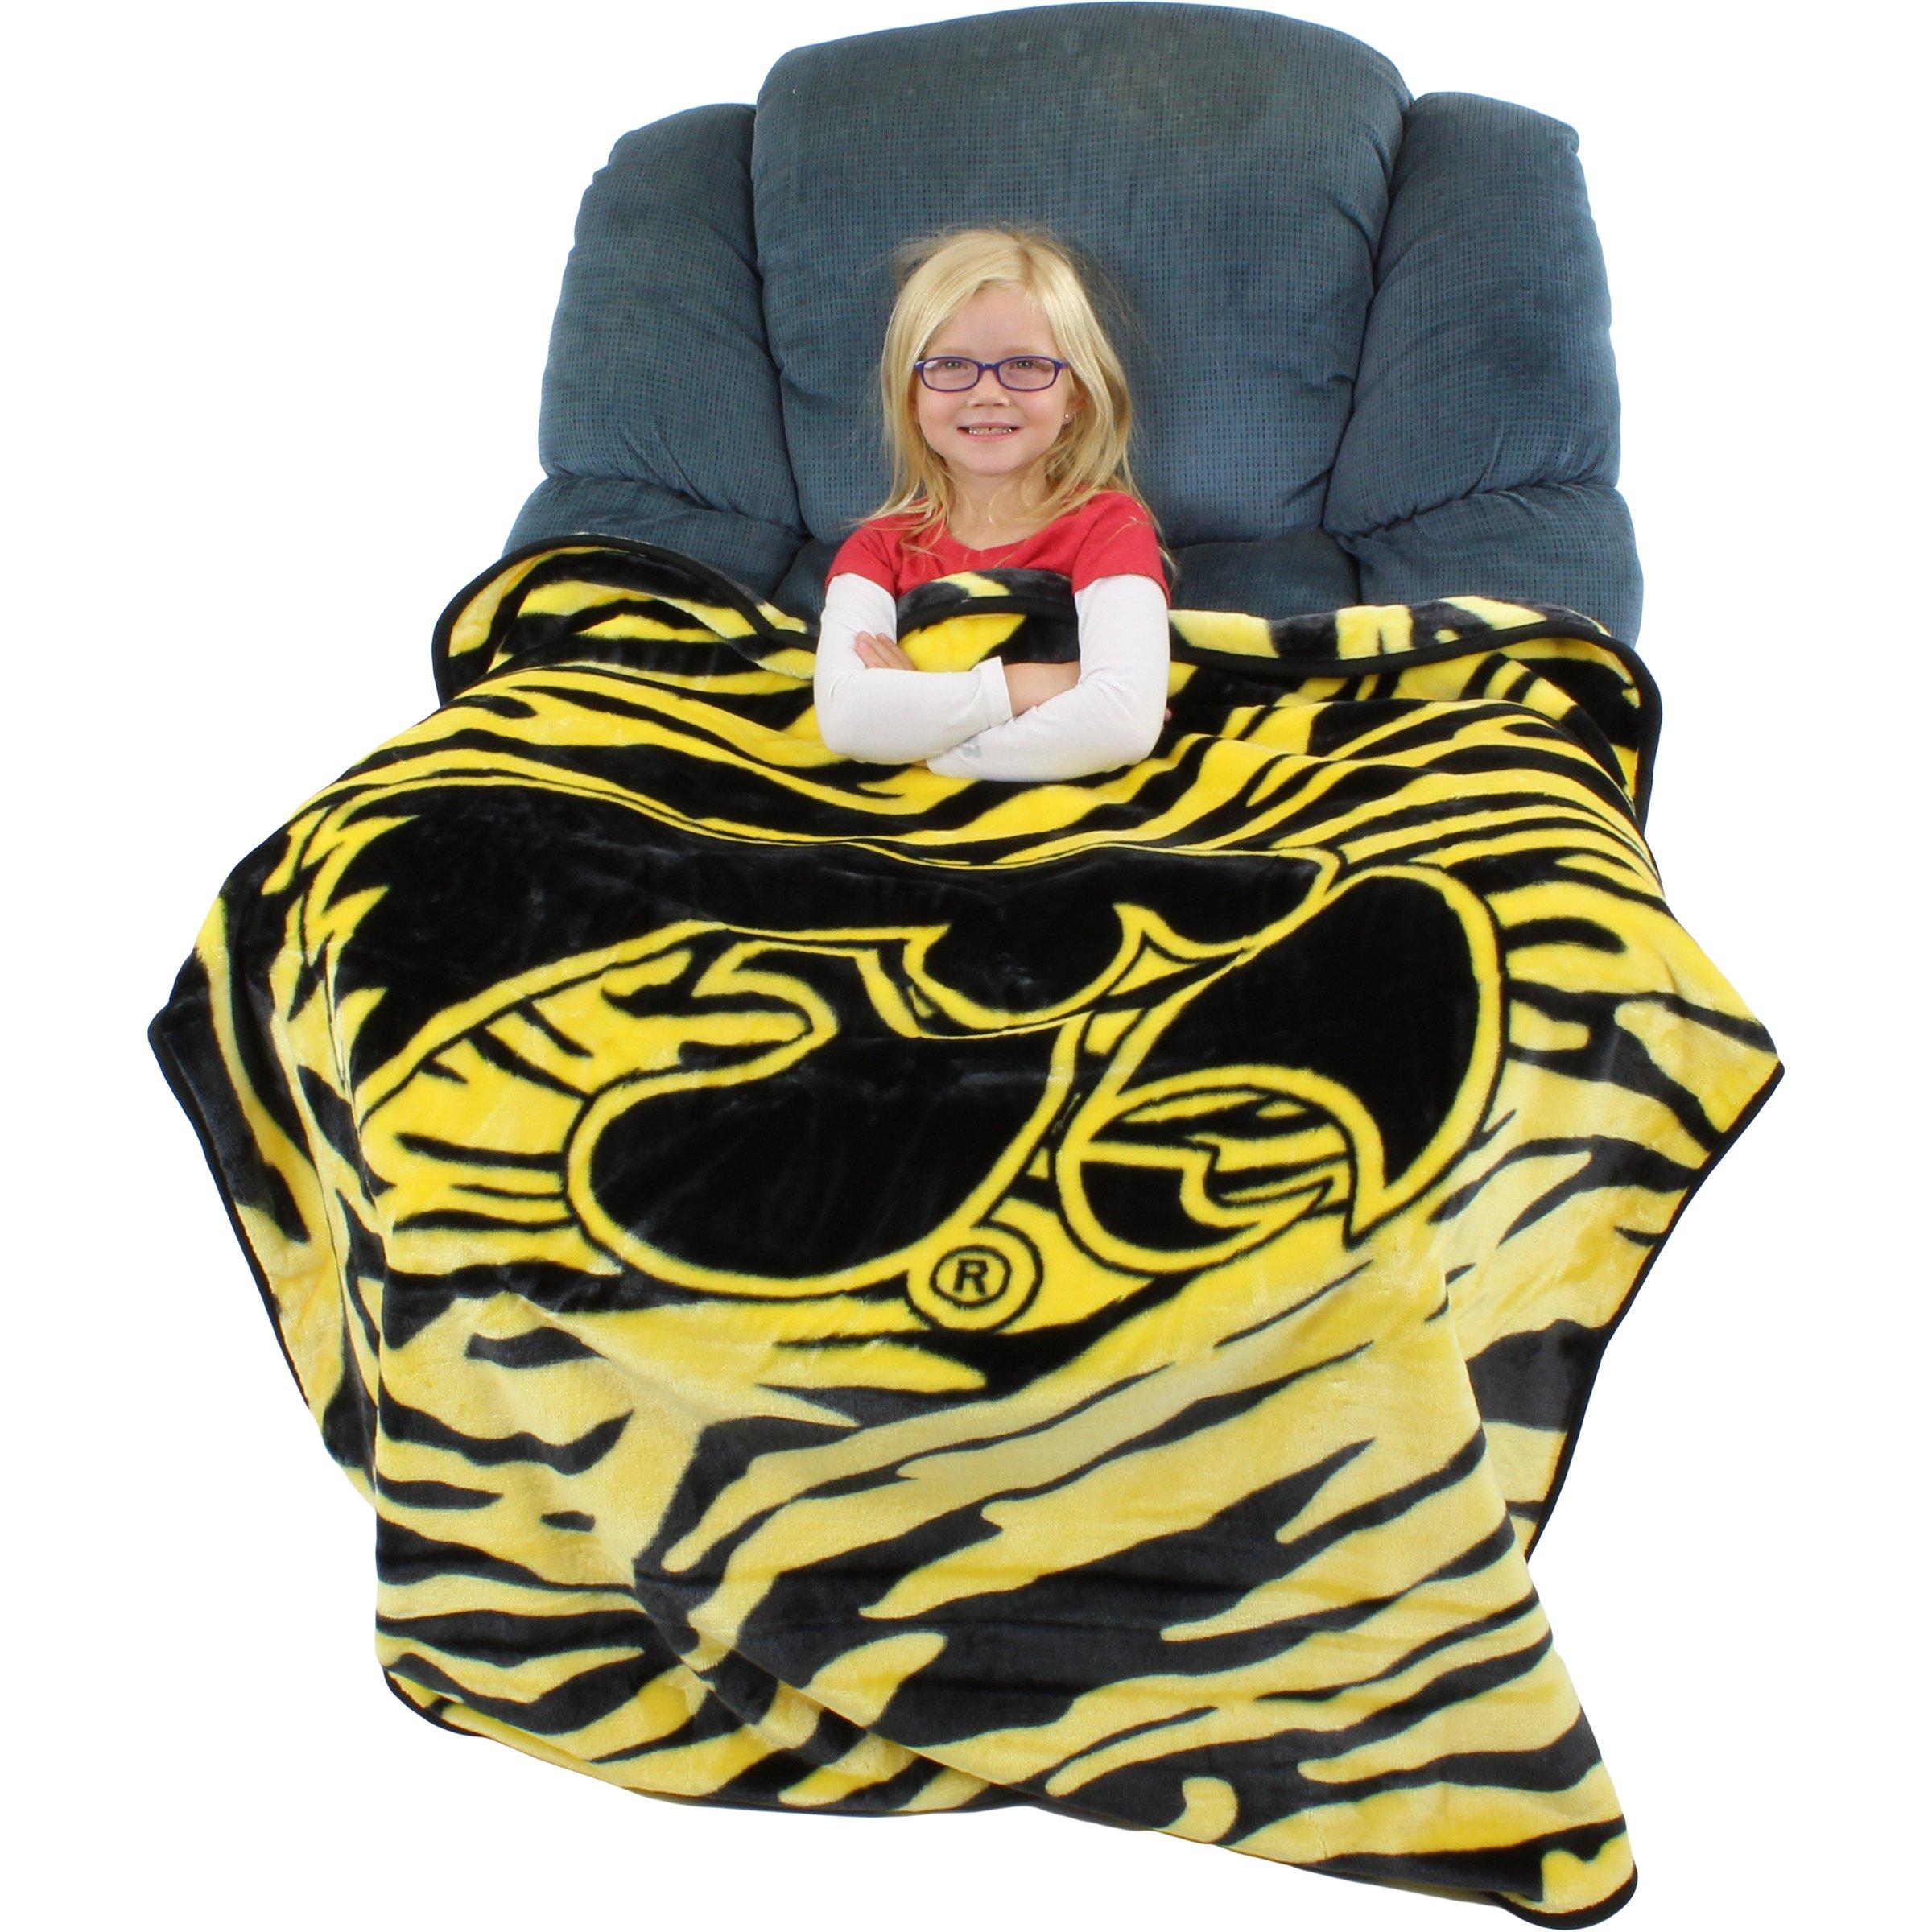 College Covers Iowa Hawkeyes Super Soft Raschel Throw Blanket, 50'' x 60''